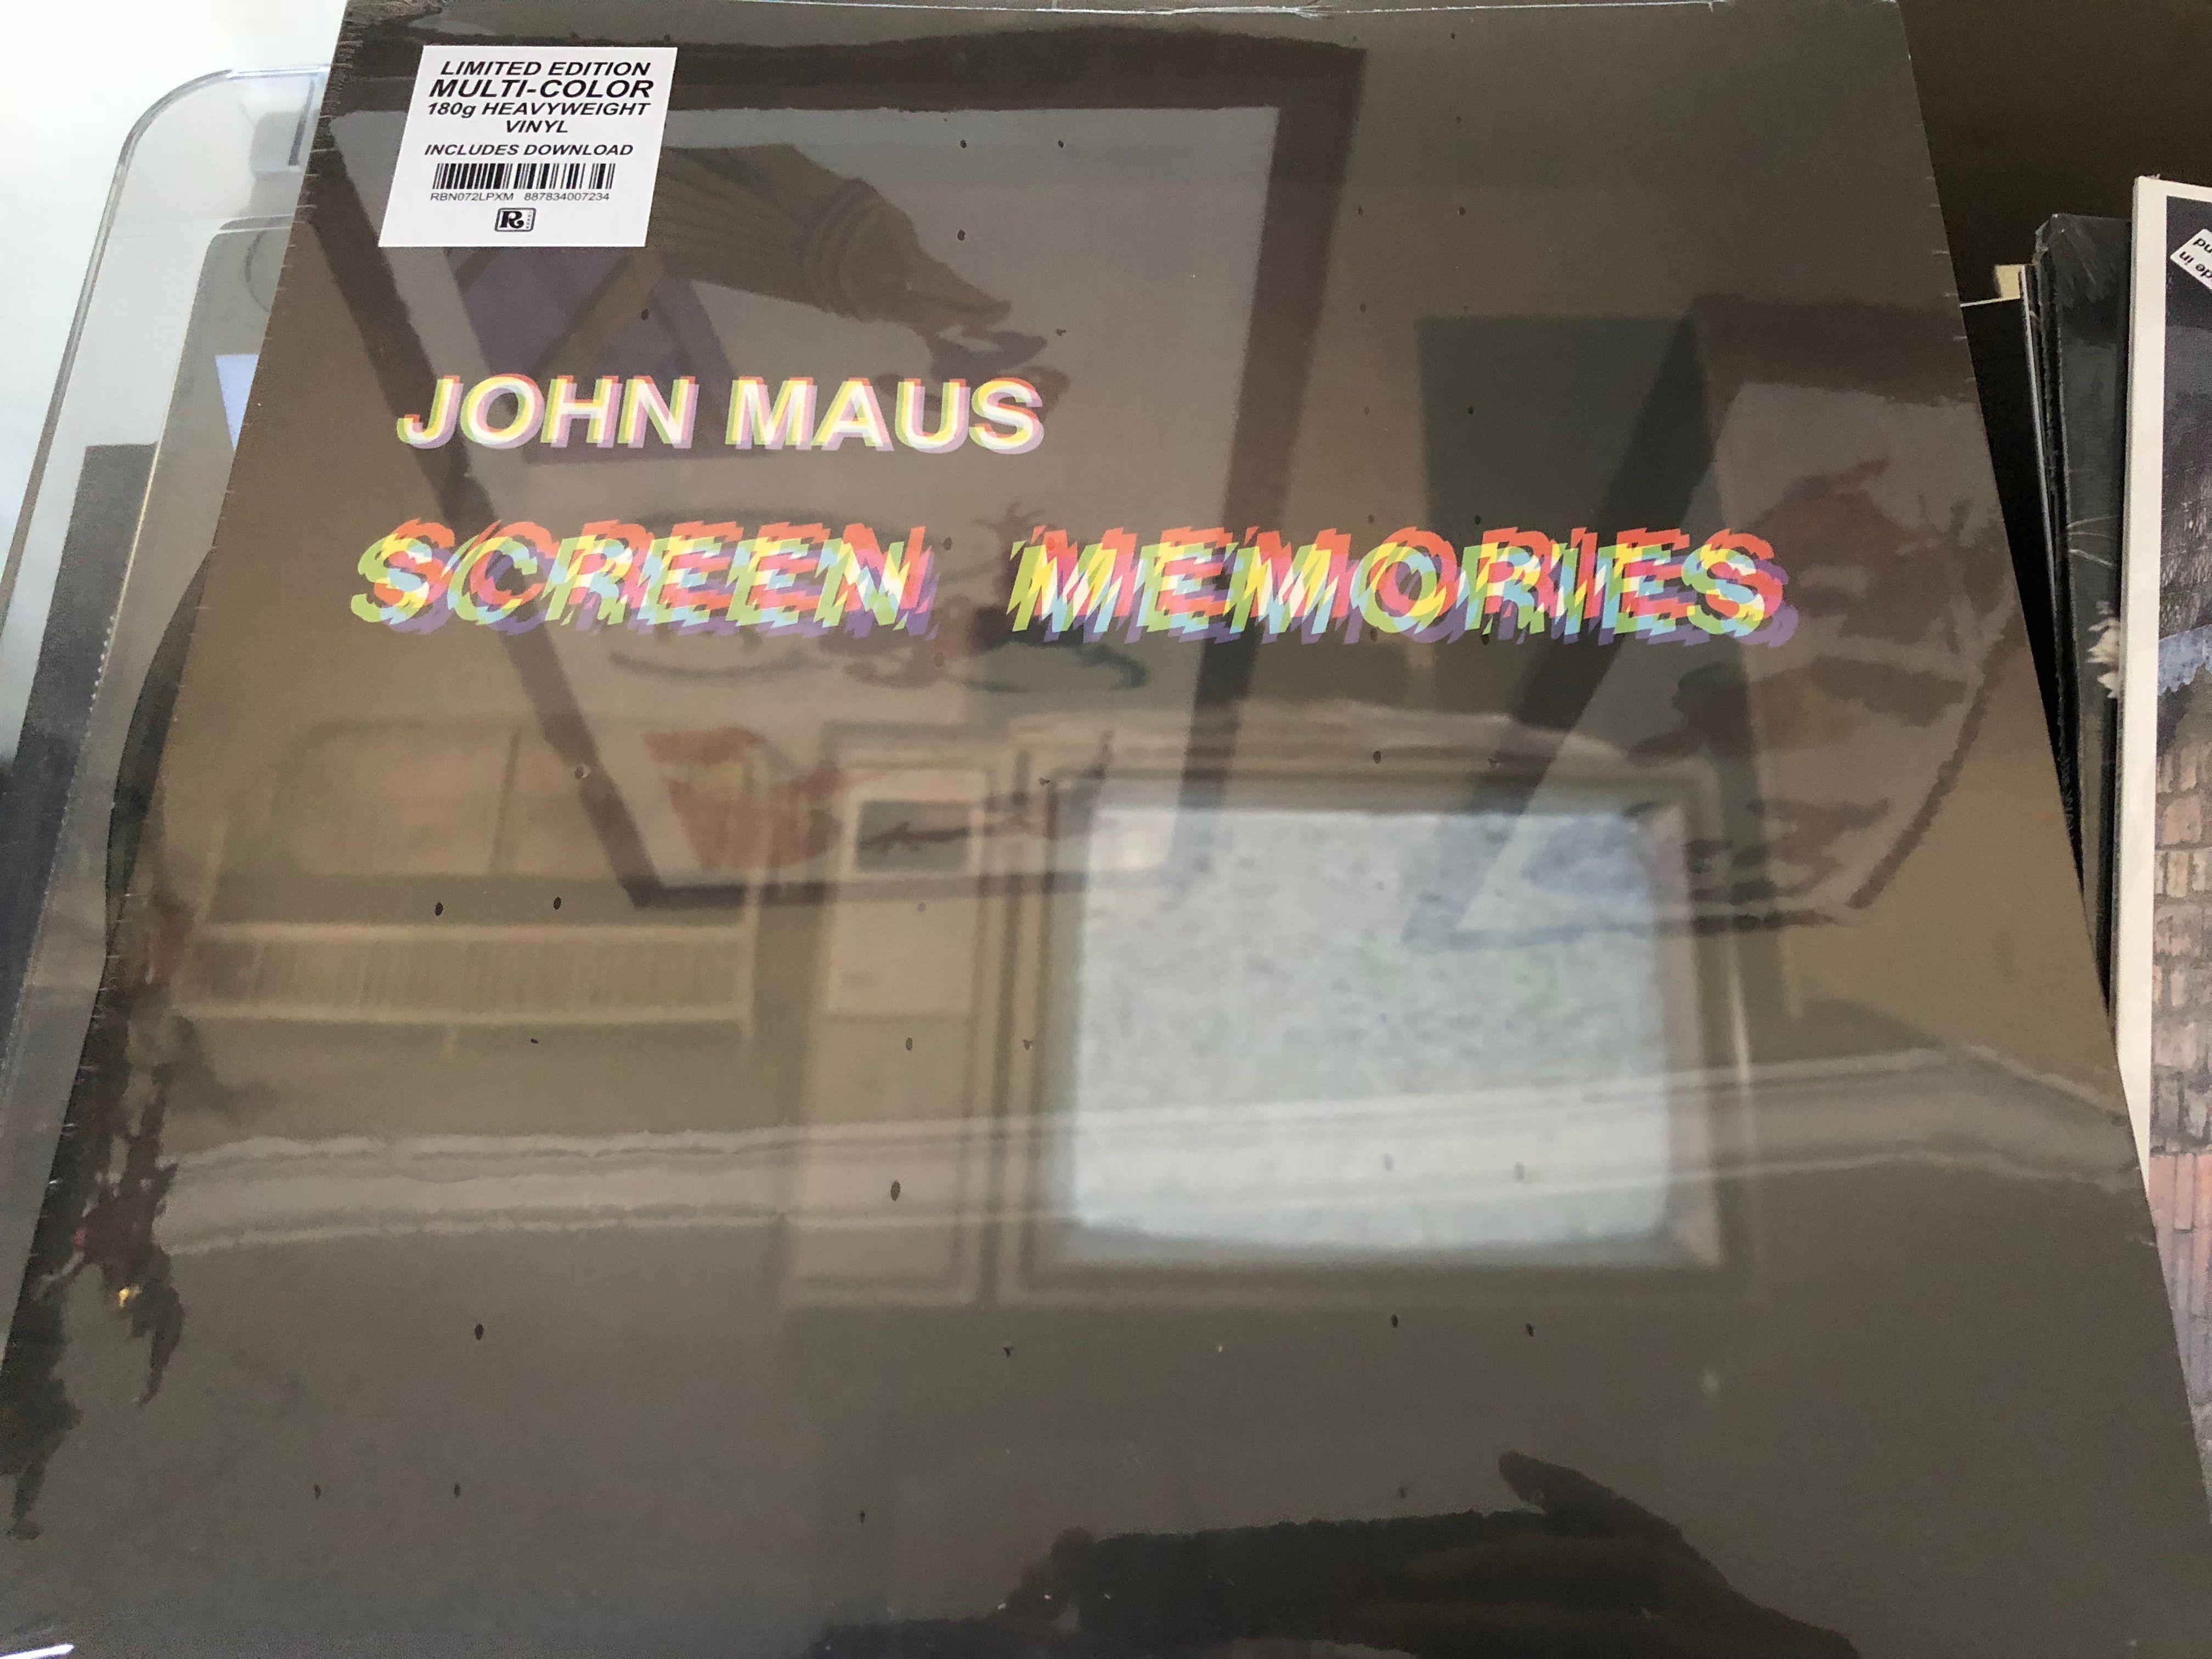 John Maus Screen Memories Colored Vinyl Vinyl Record Collection Vinyl Records Vinyl